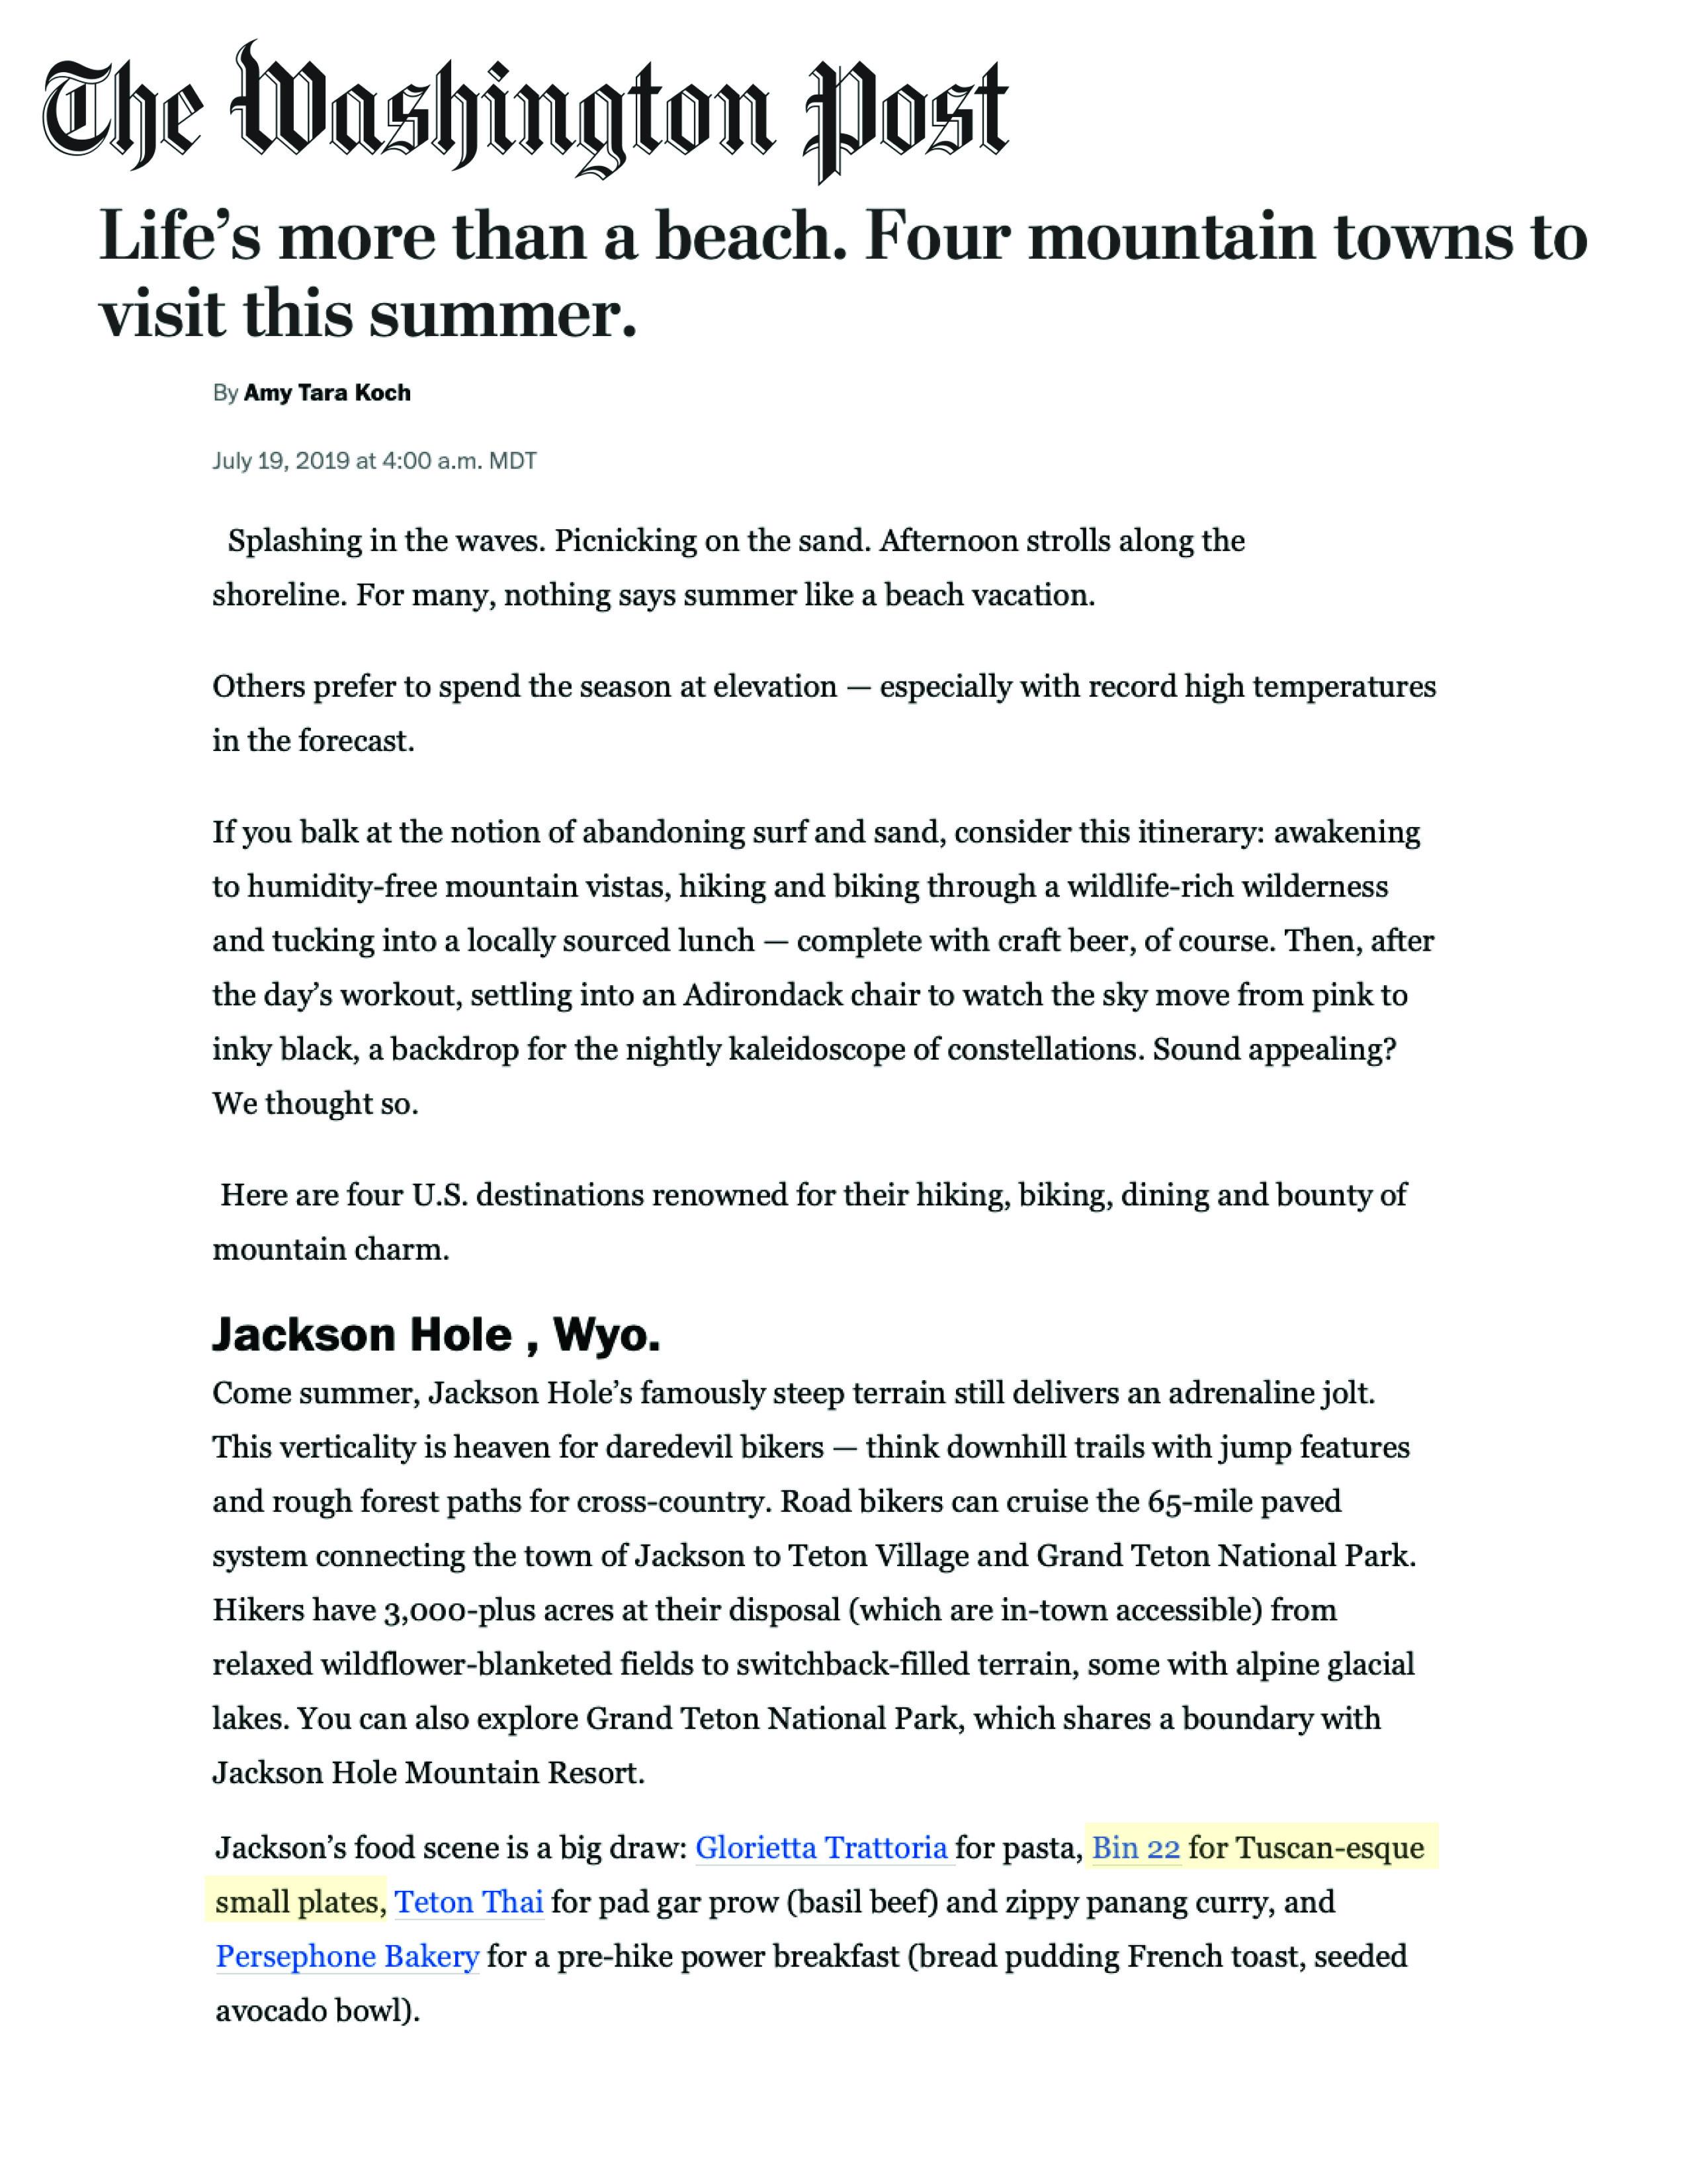 Press item at Bin 22 - The Washington Post